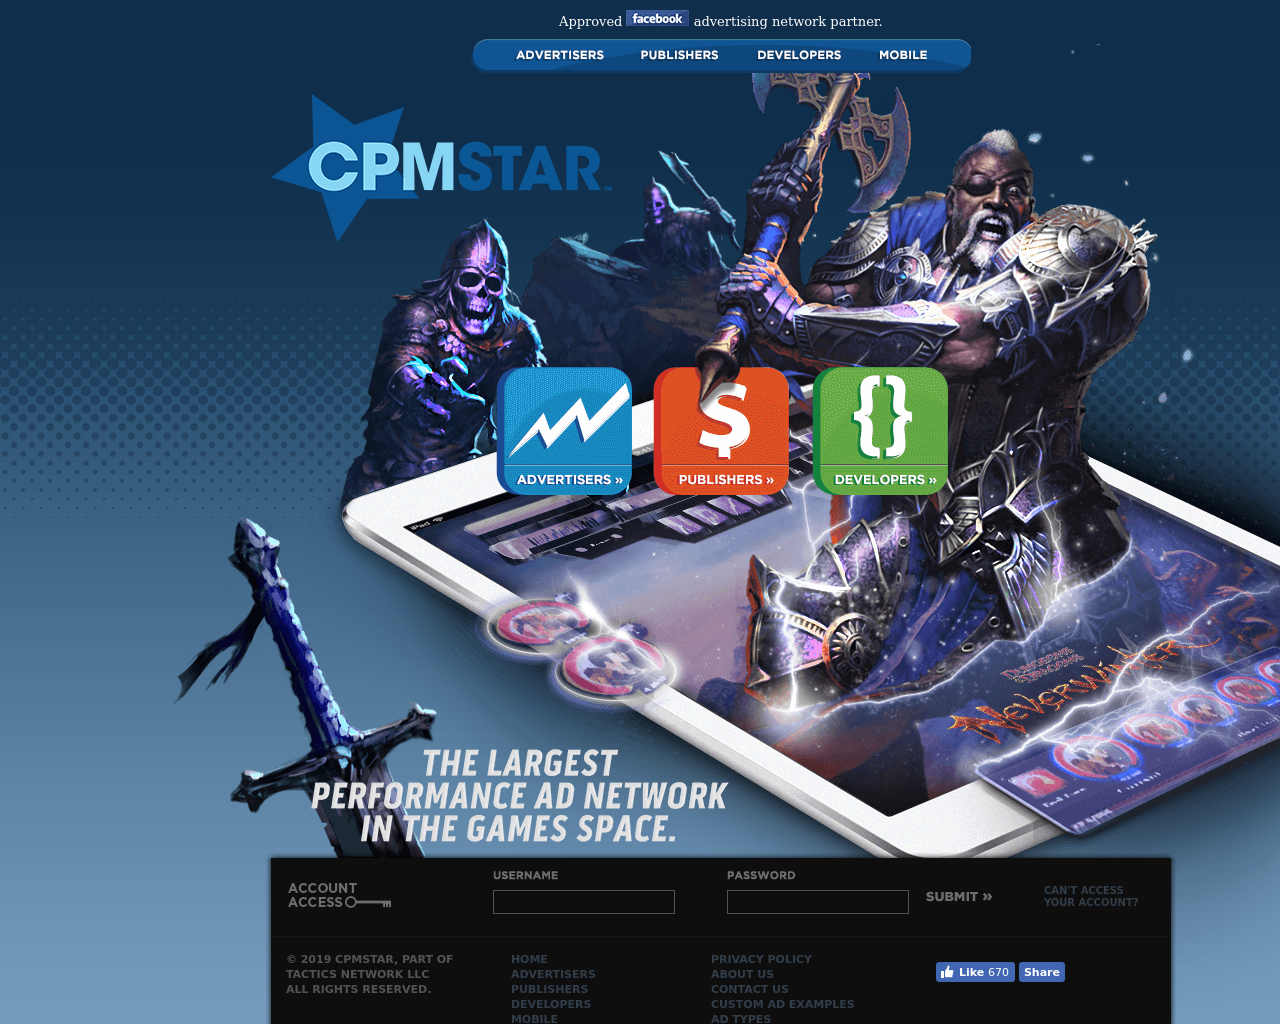 CPM Star Advertising Mediakits, Reviews, Pricing, Traffic